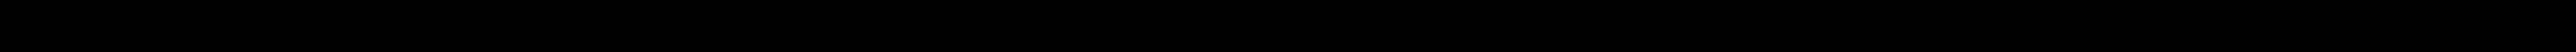 du10Artboard 3_4x.png